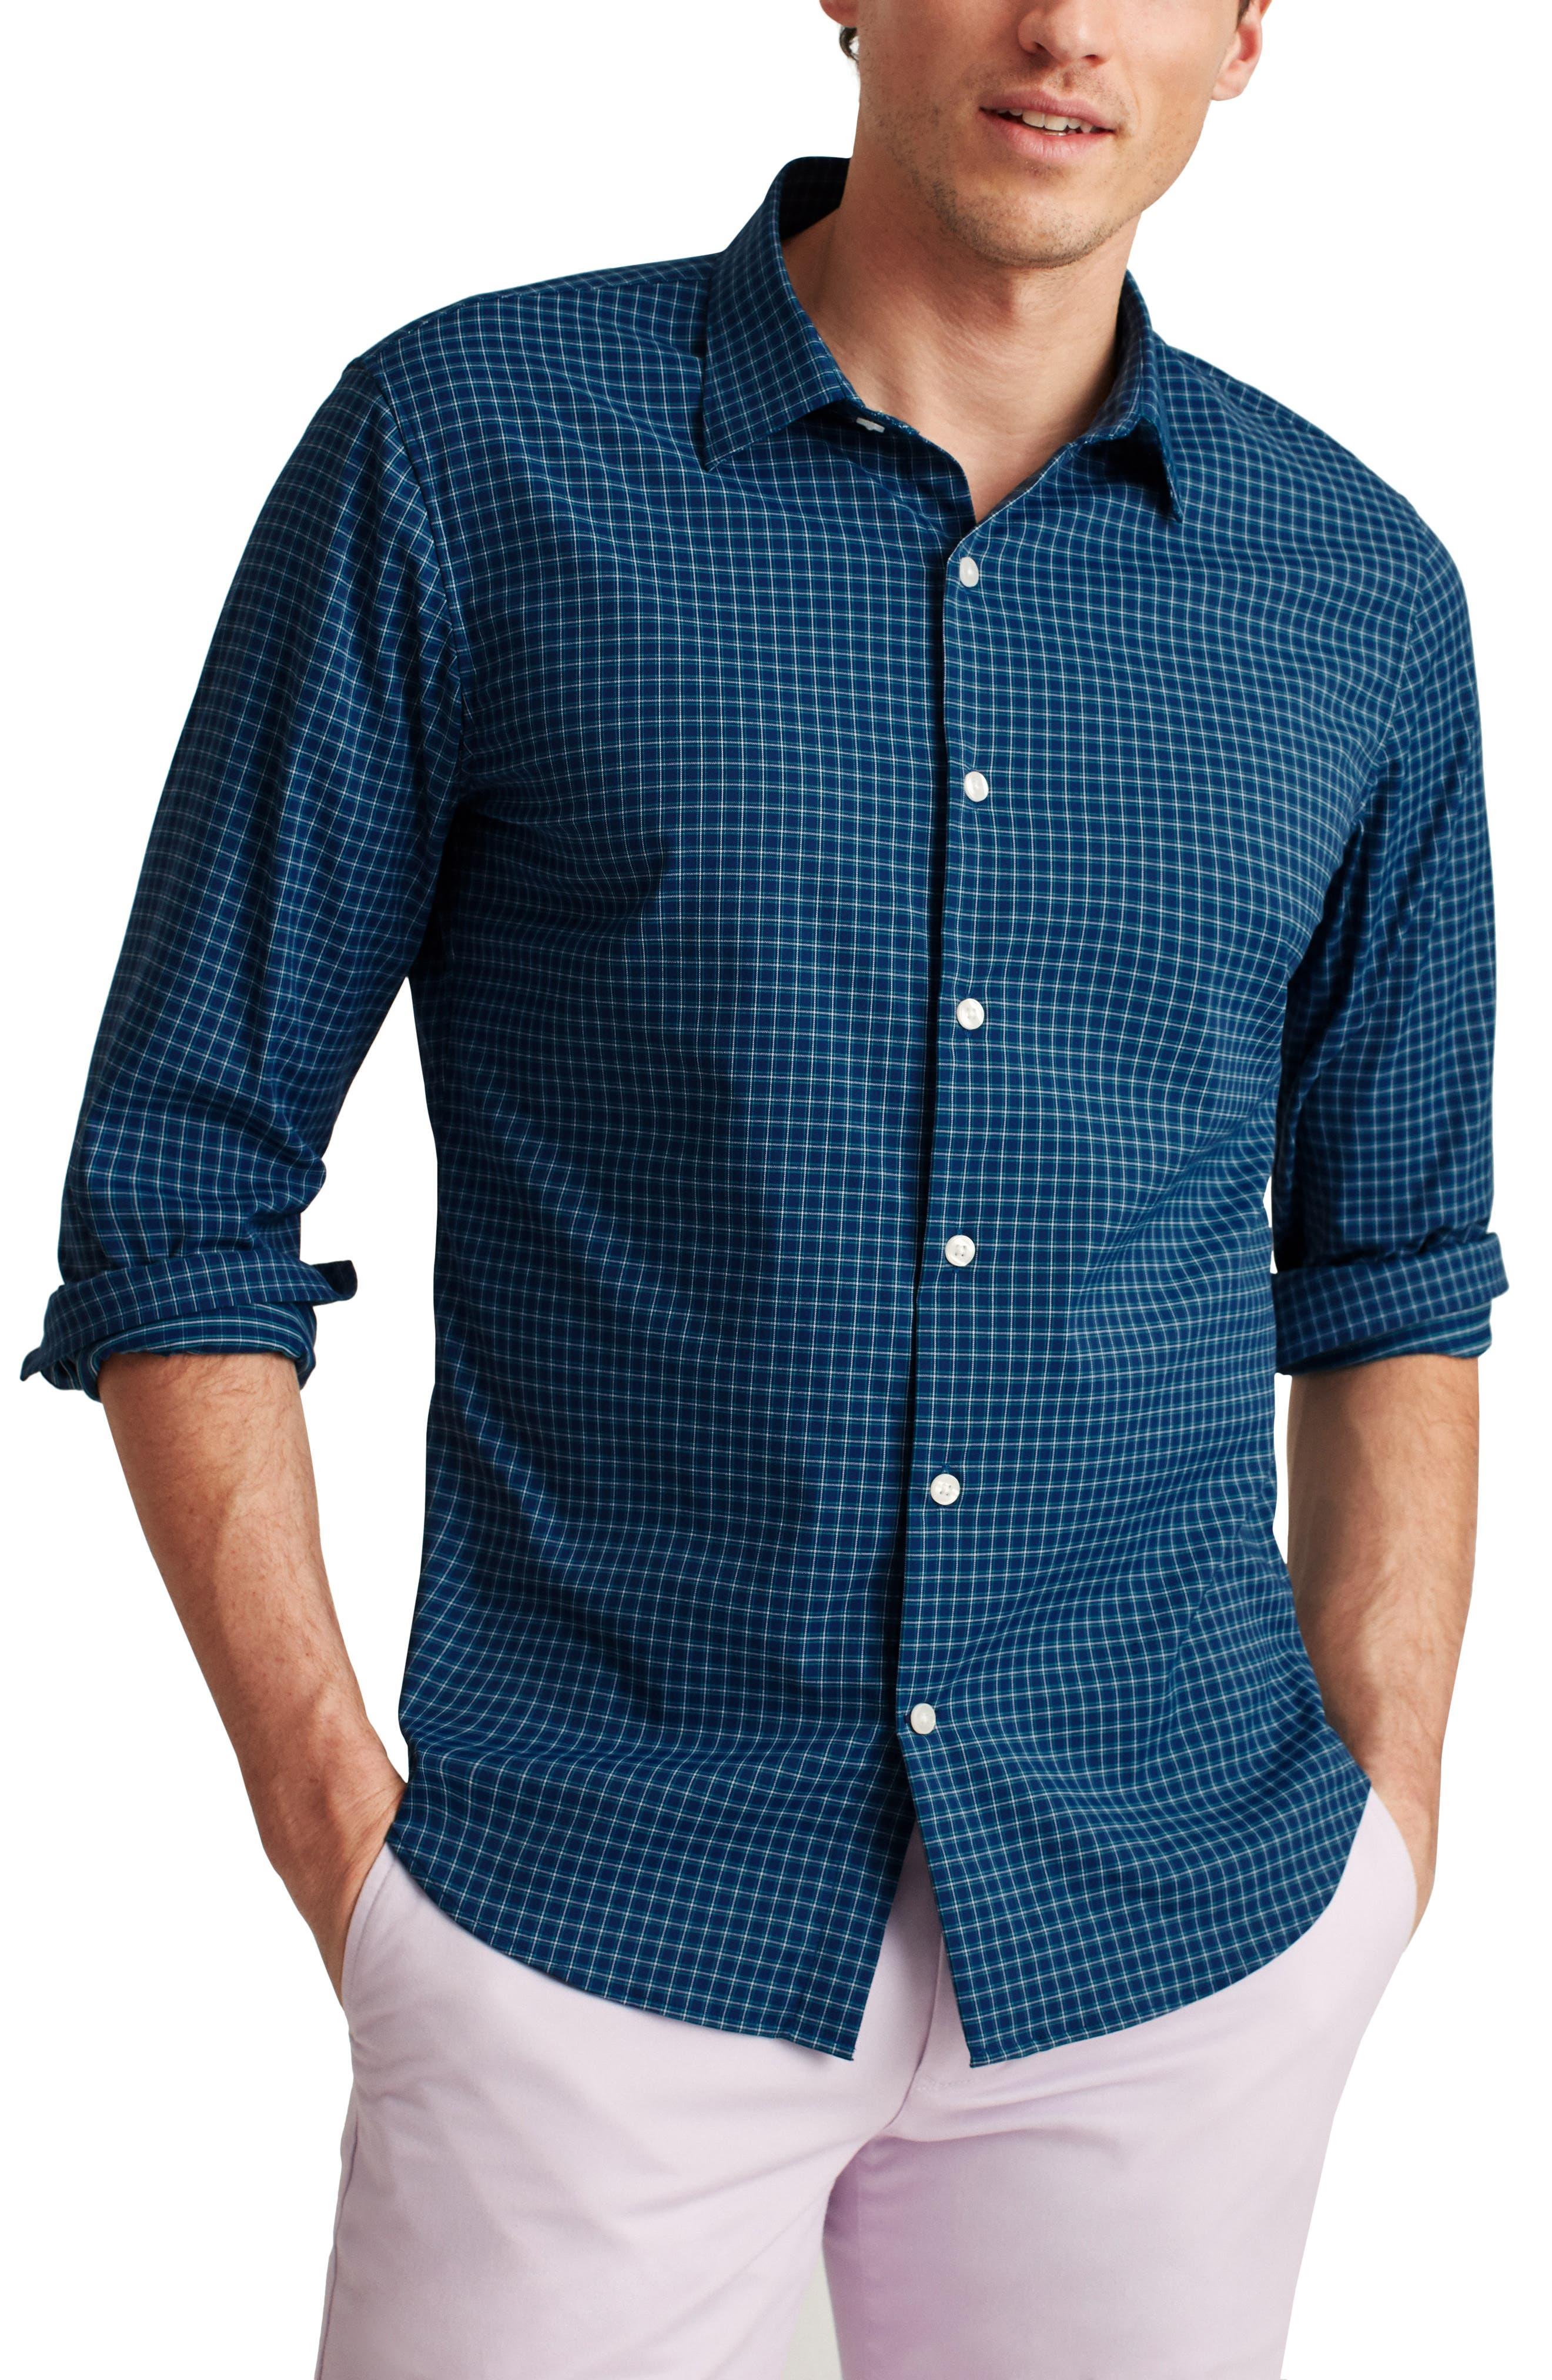 Tech Slim Fit Check Stretch Button-Up Shirt